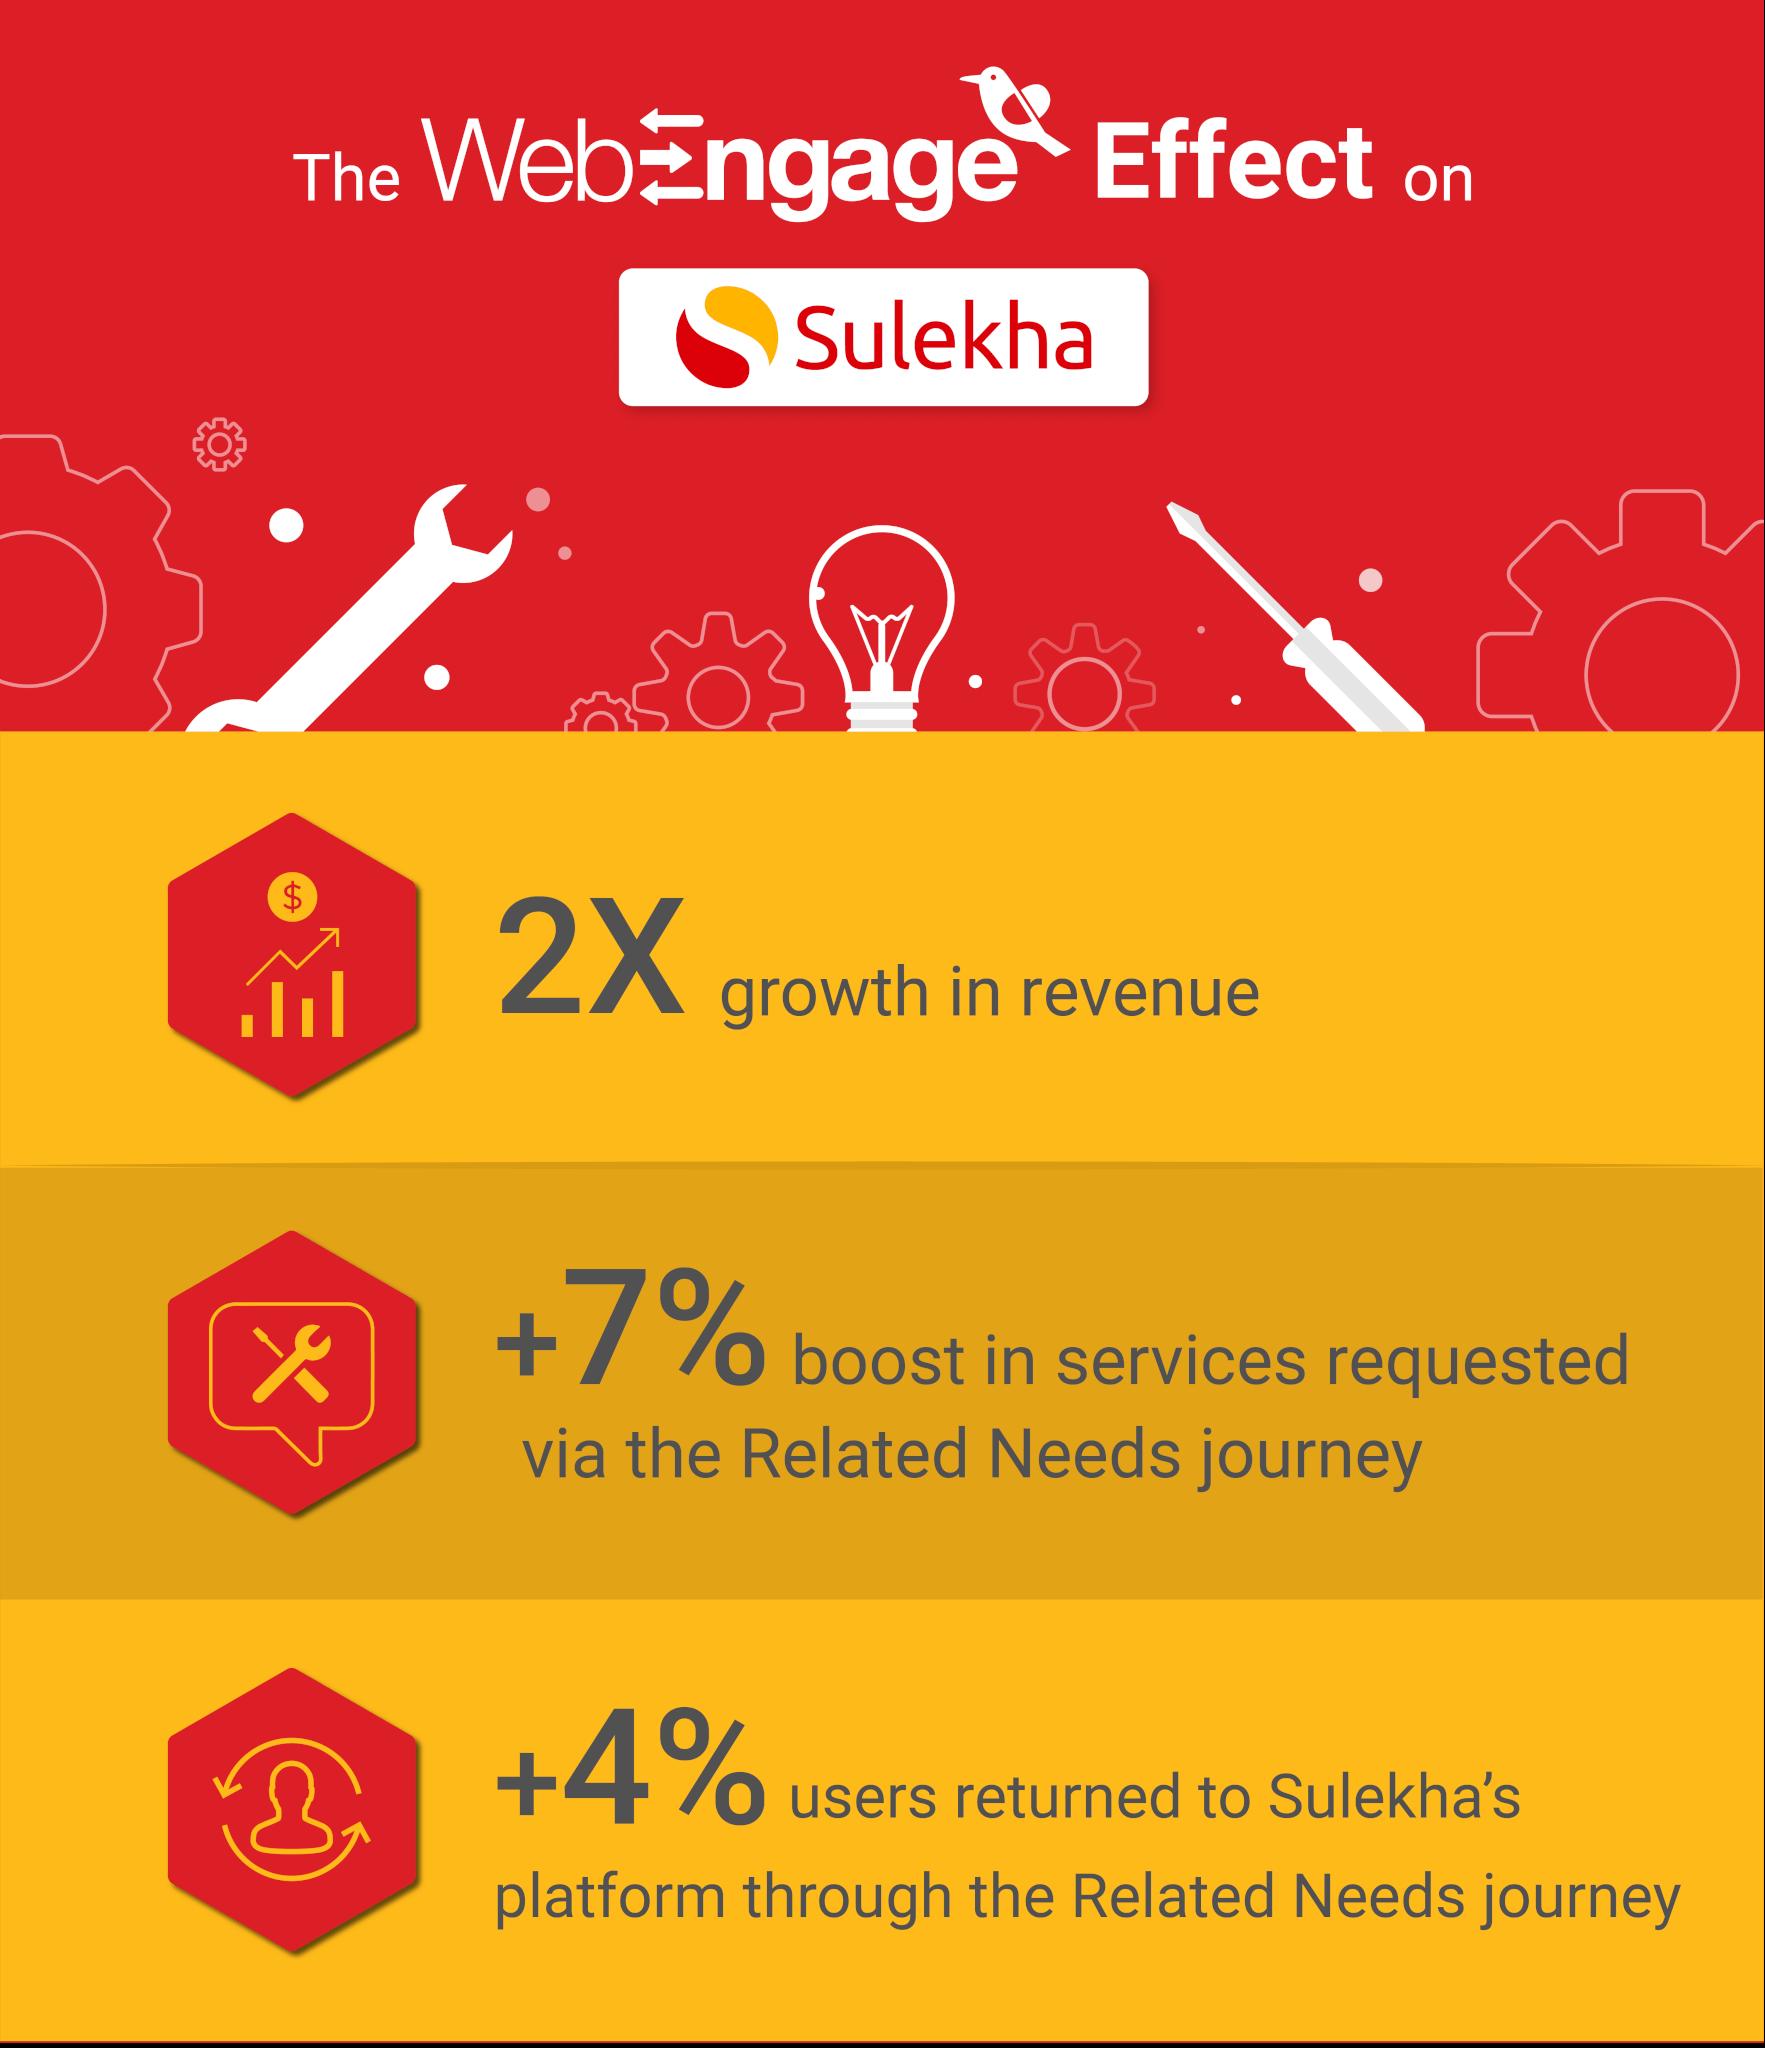 Sulekha witnesses 2X growth in revenue using WebEngage | Case Study